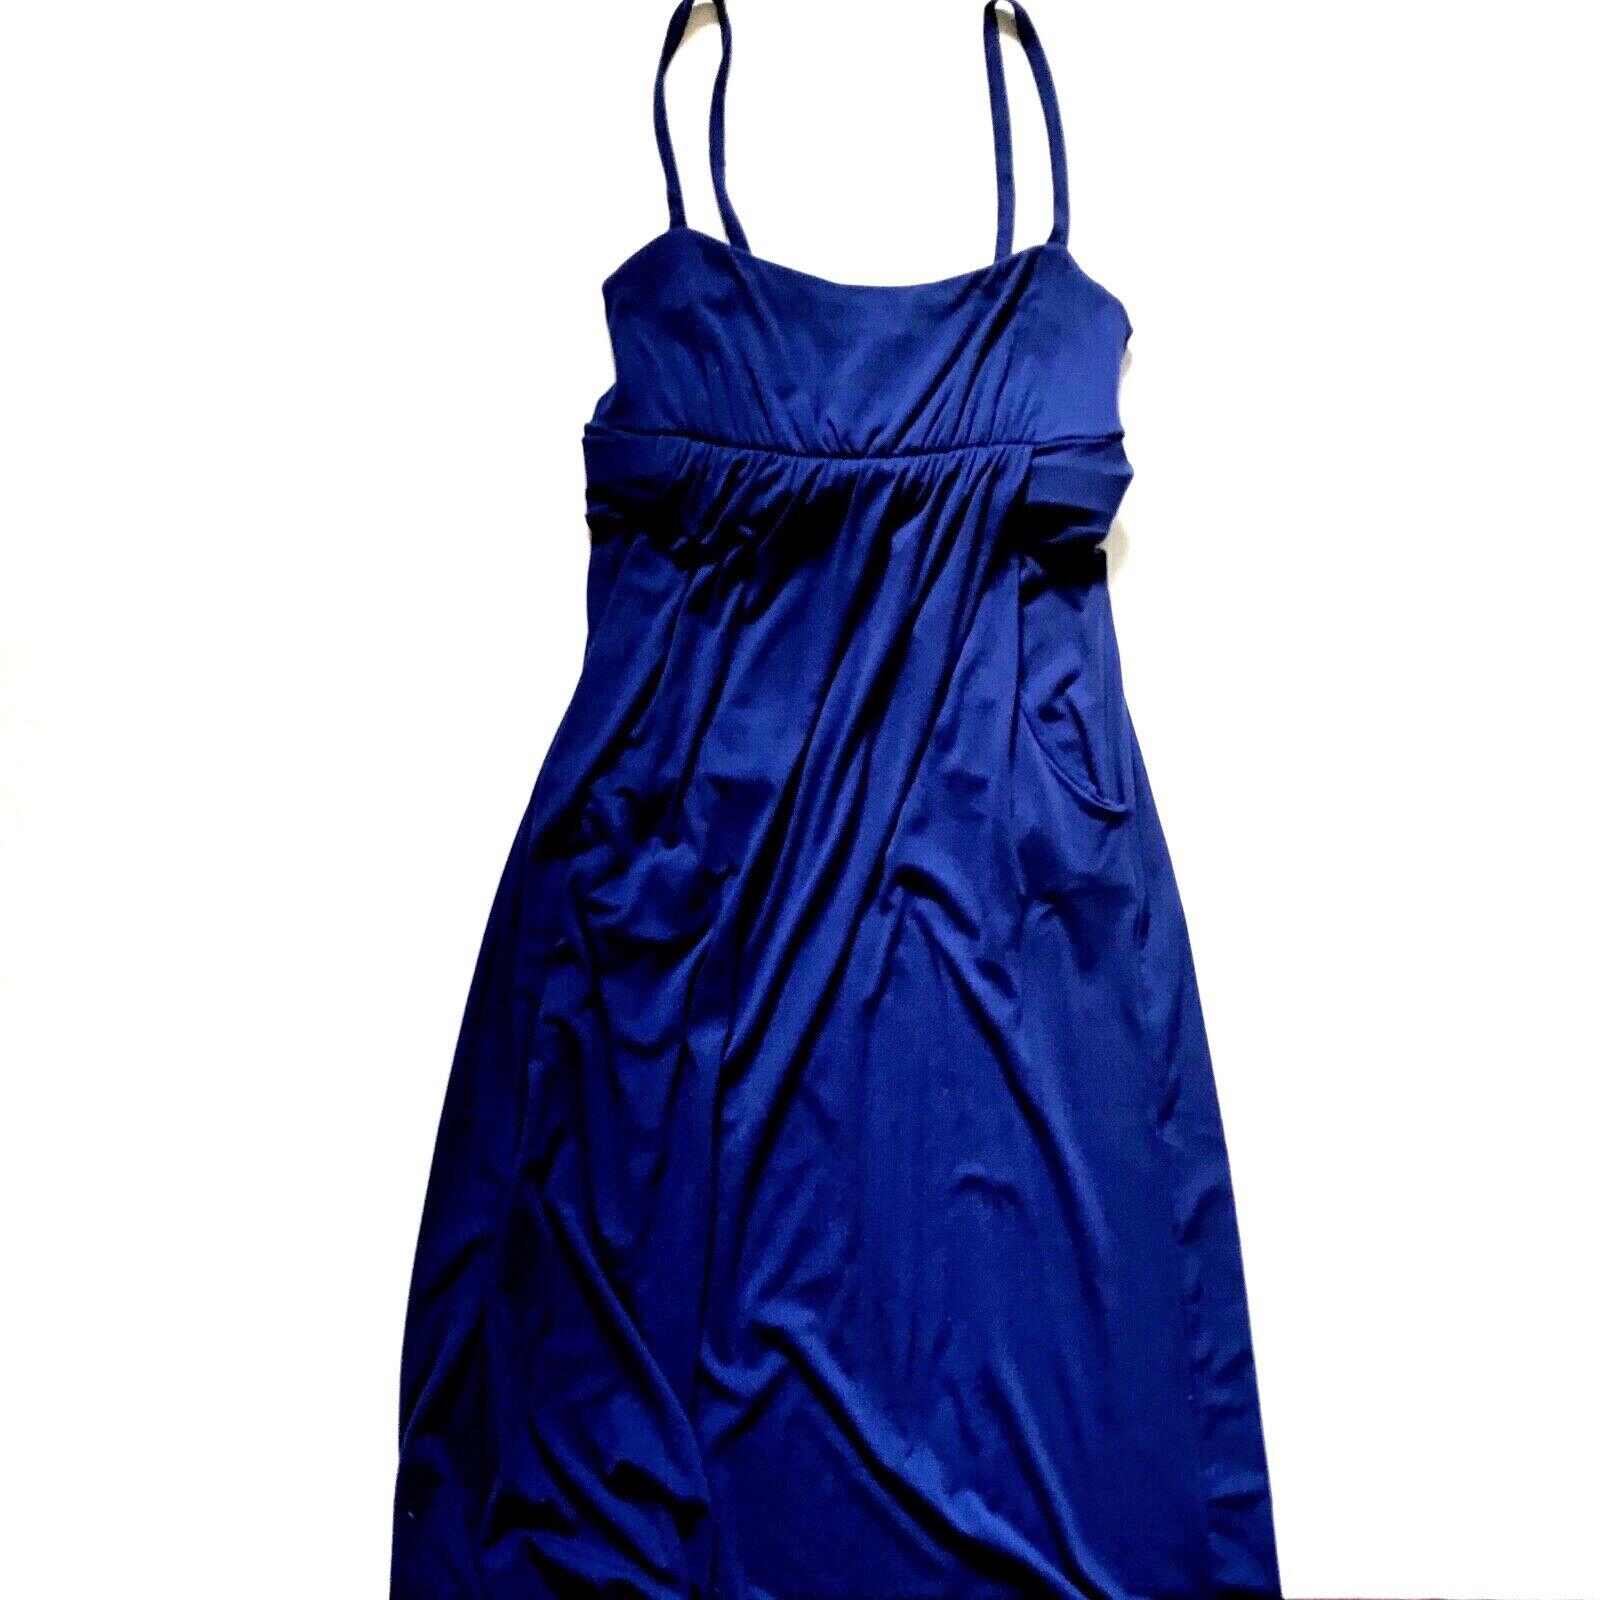 Susana Monaco Maxi Tank Dress damen Medium Navy Blau Sleeveless Long Maxi EUC